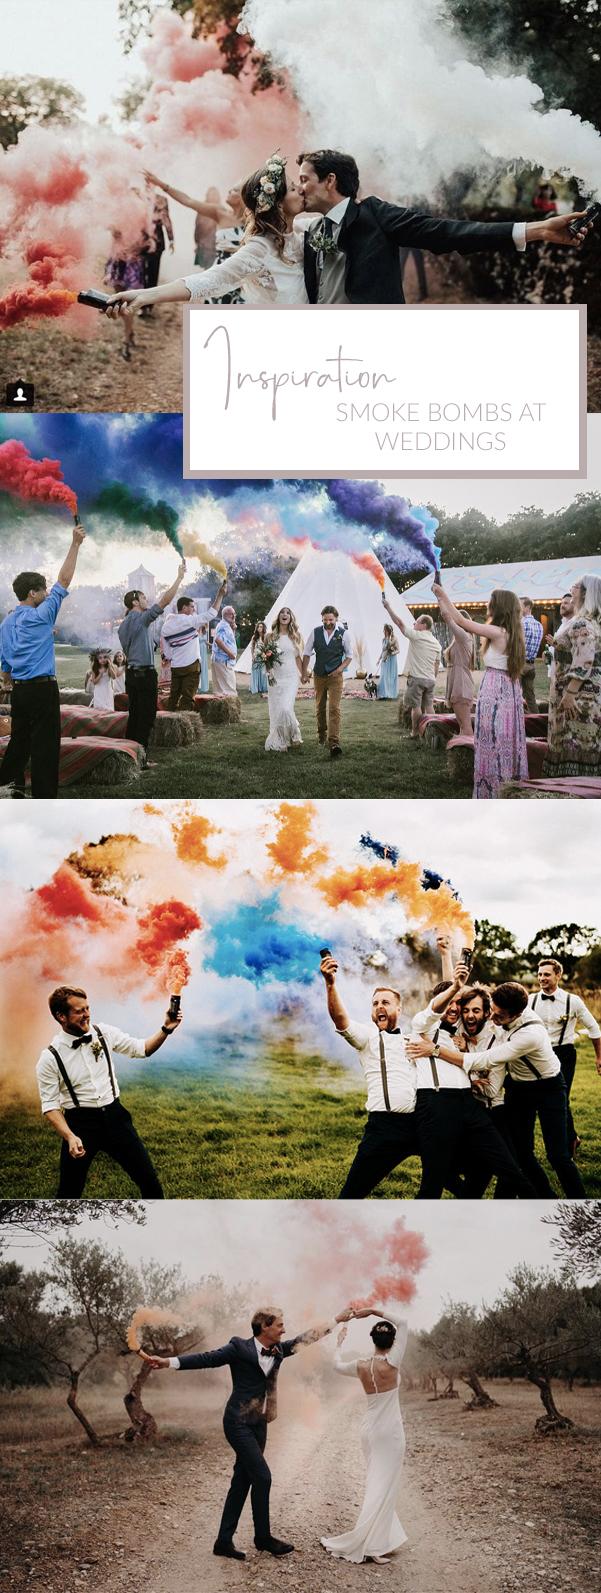 inspiration wedding smoke bombs for sale smoke bomb wedding photos ceremony